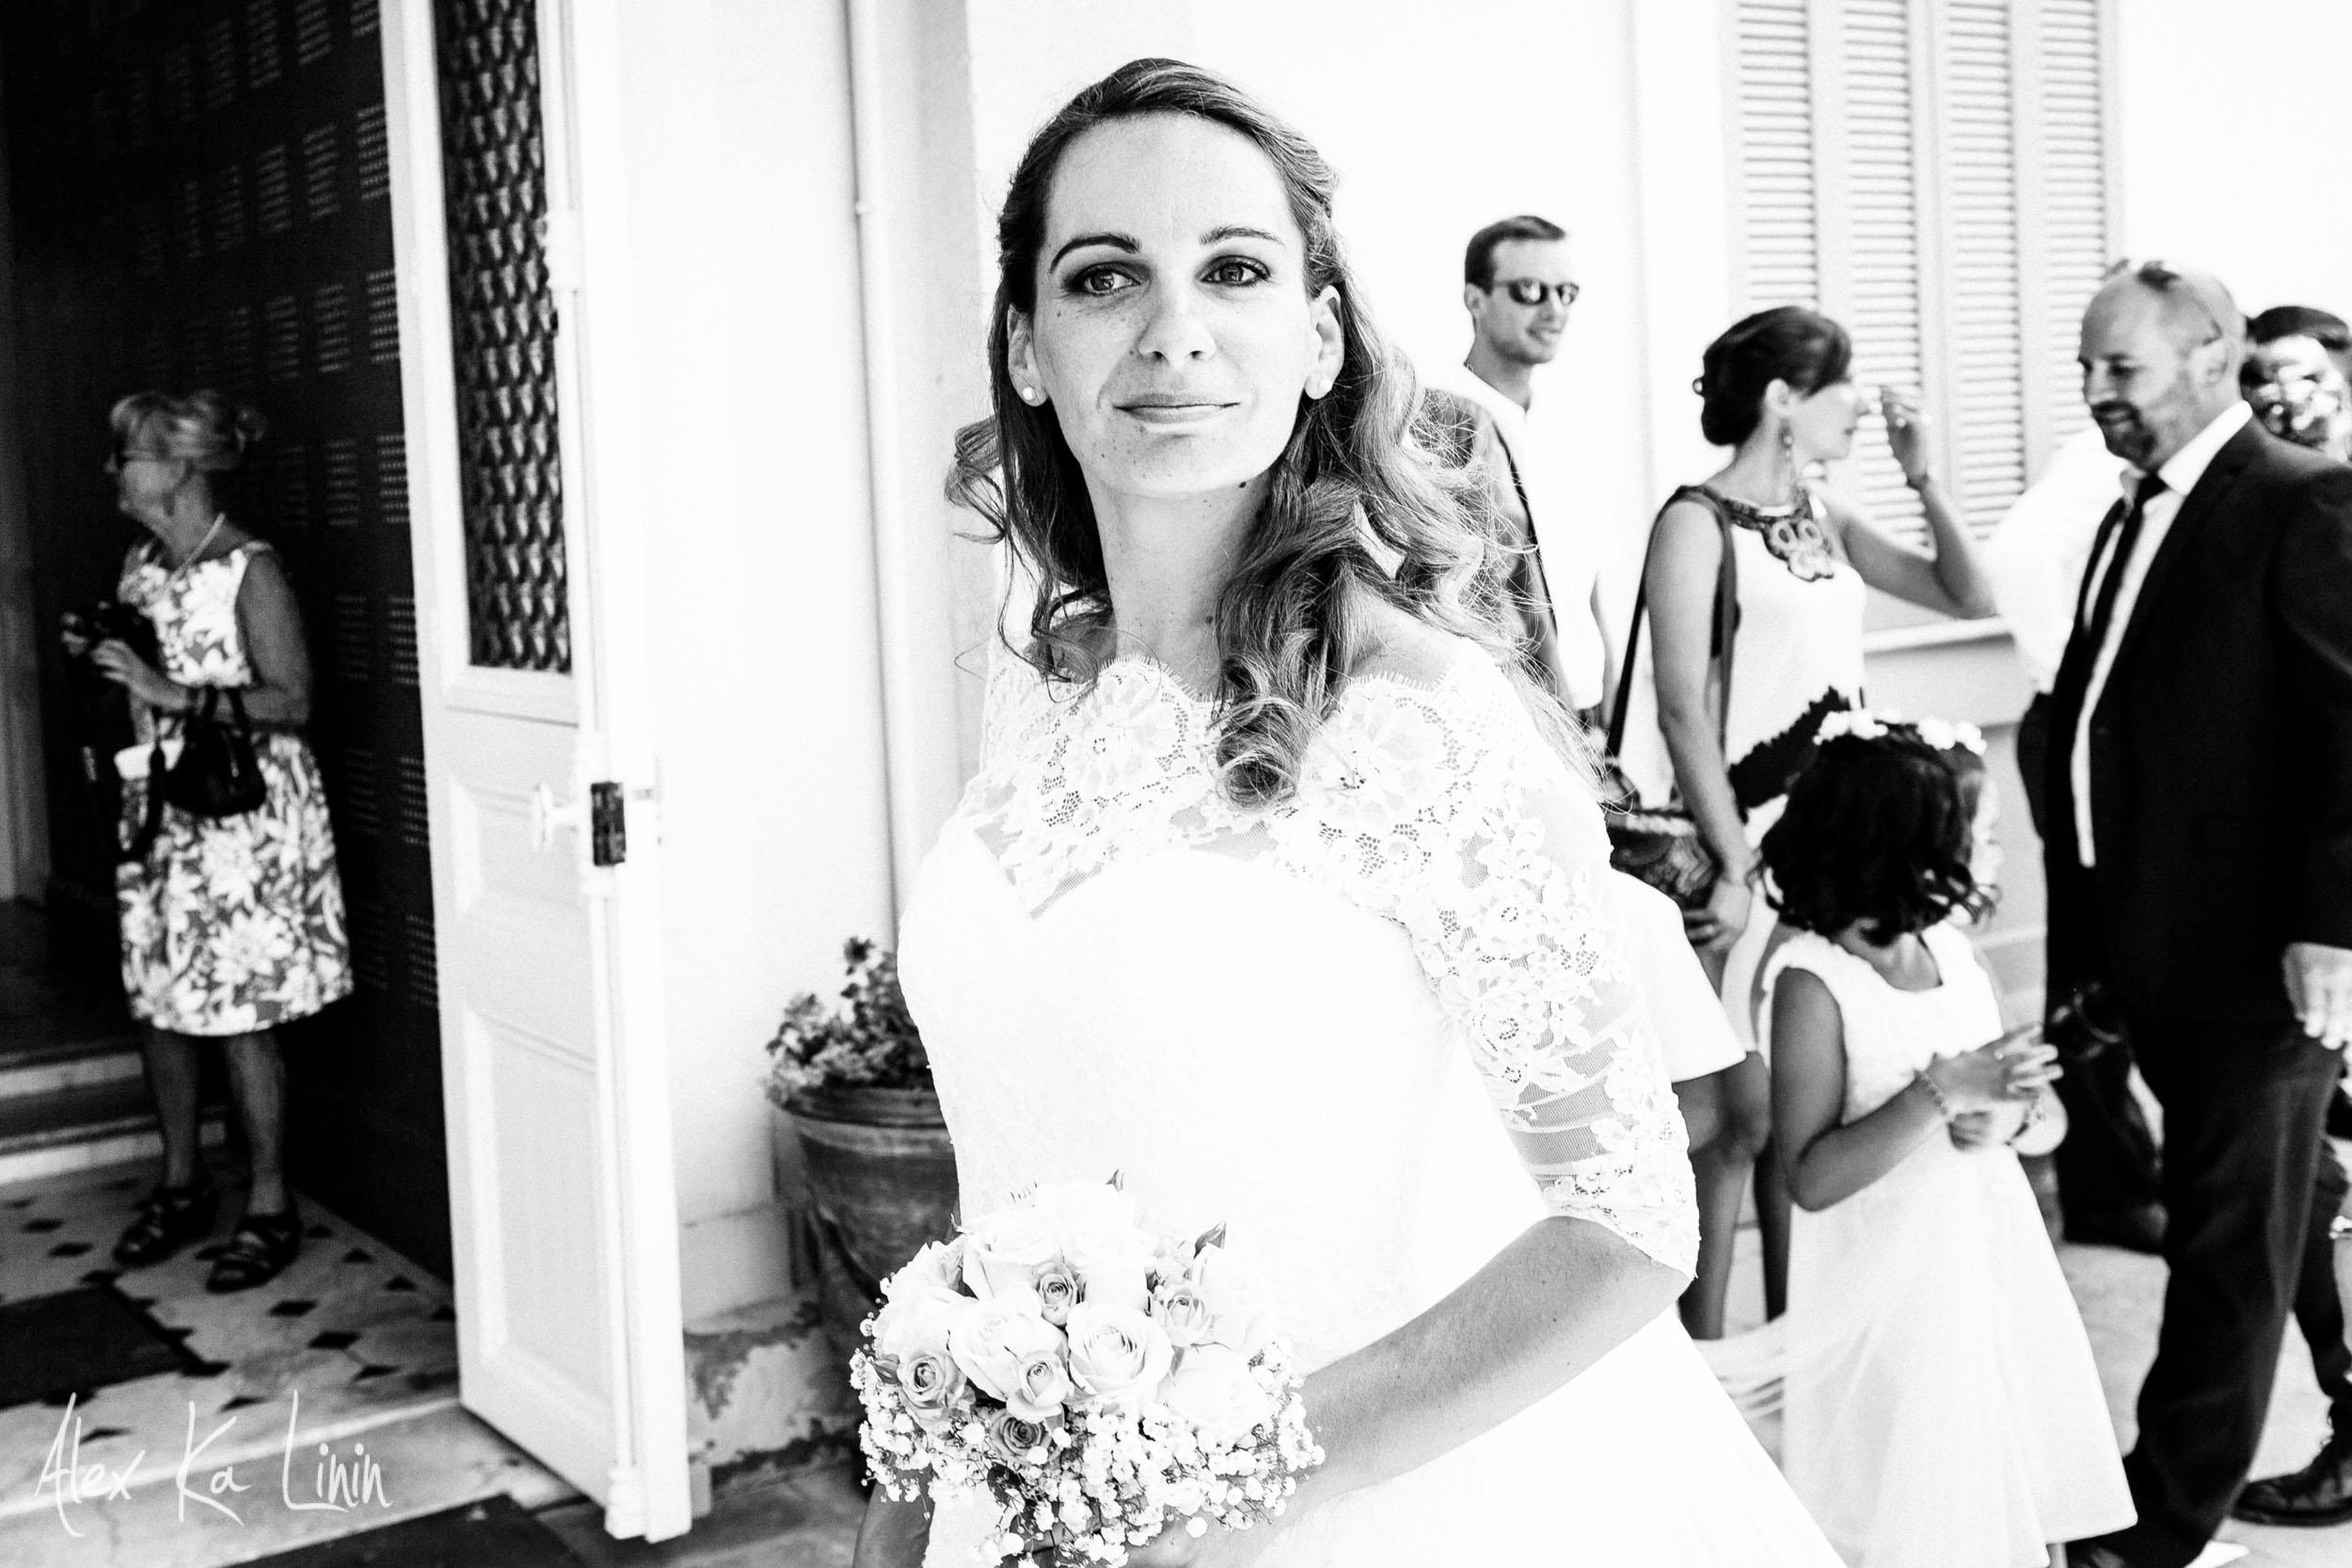 AlexKa_wedding_mariage_photographer-10.jpg